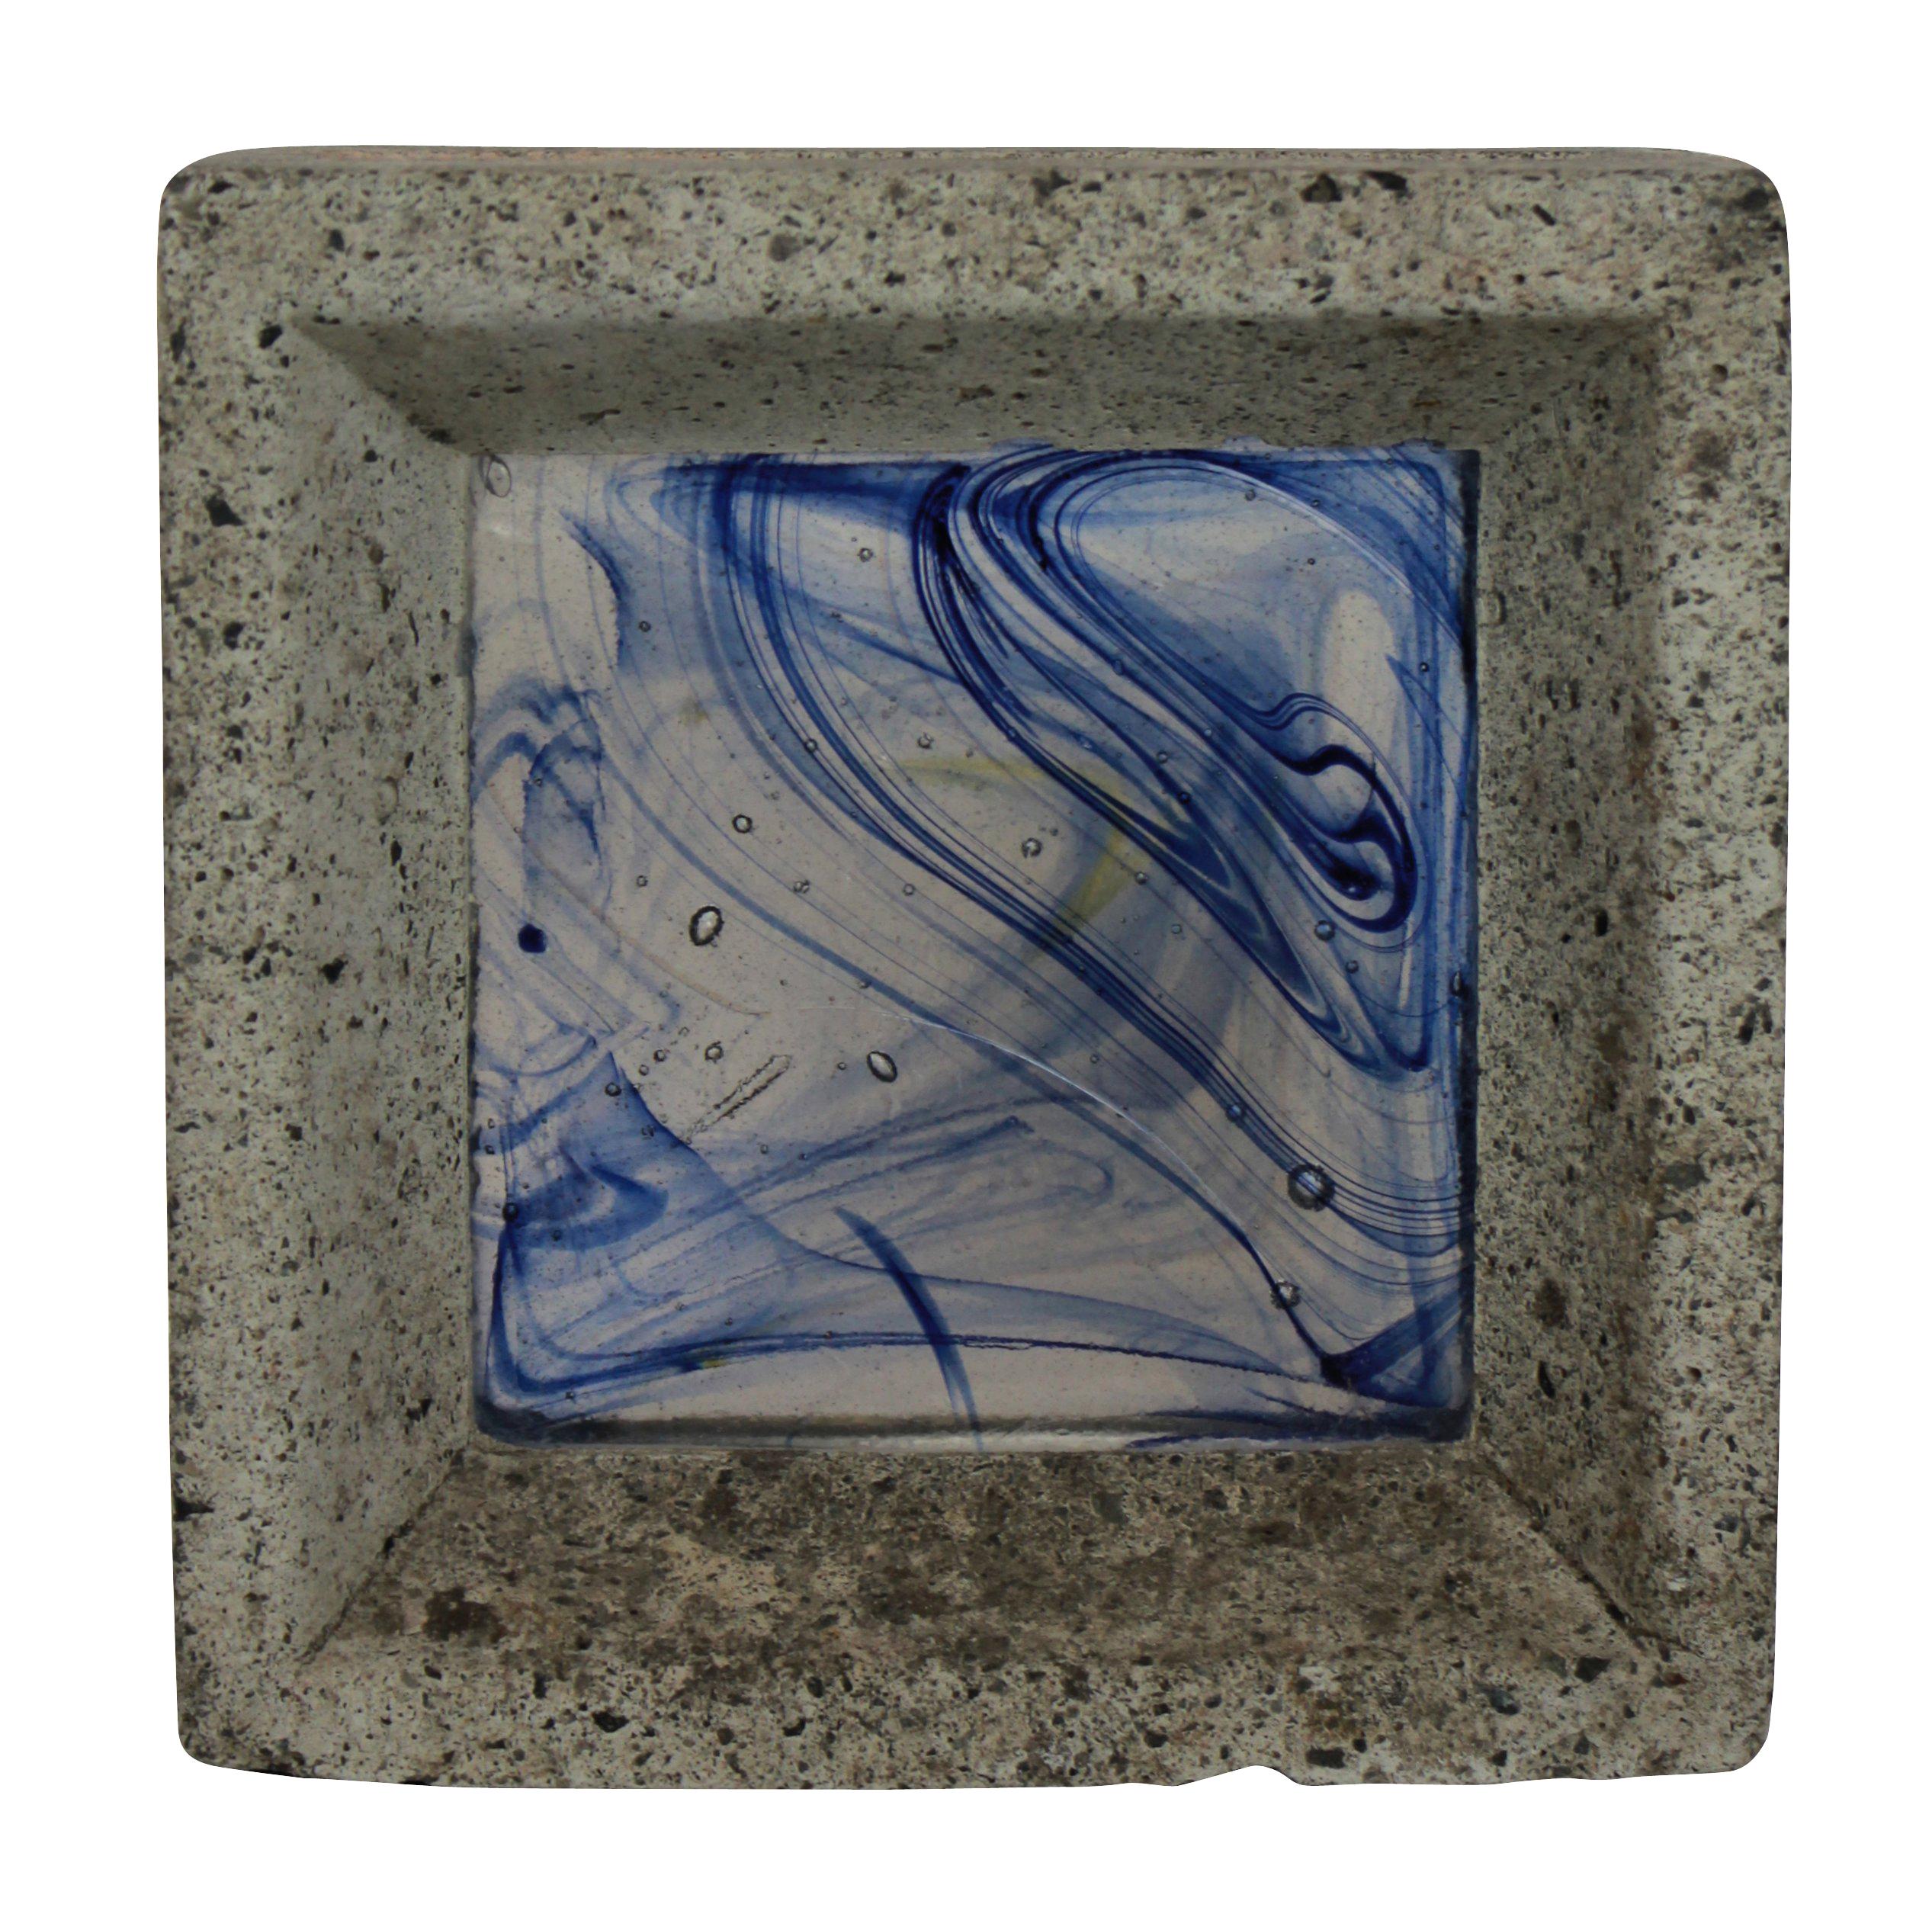 A WHITEFRIARS GLASS BRICK